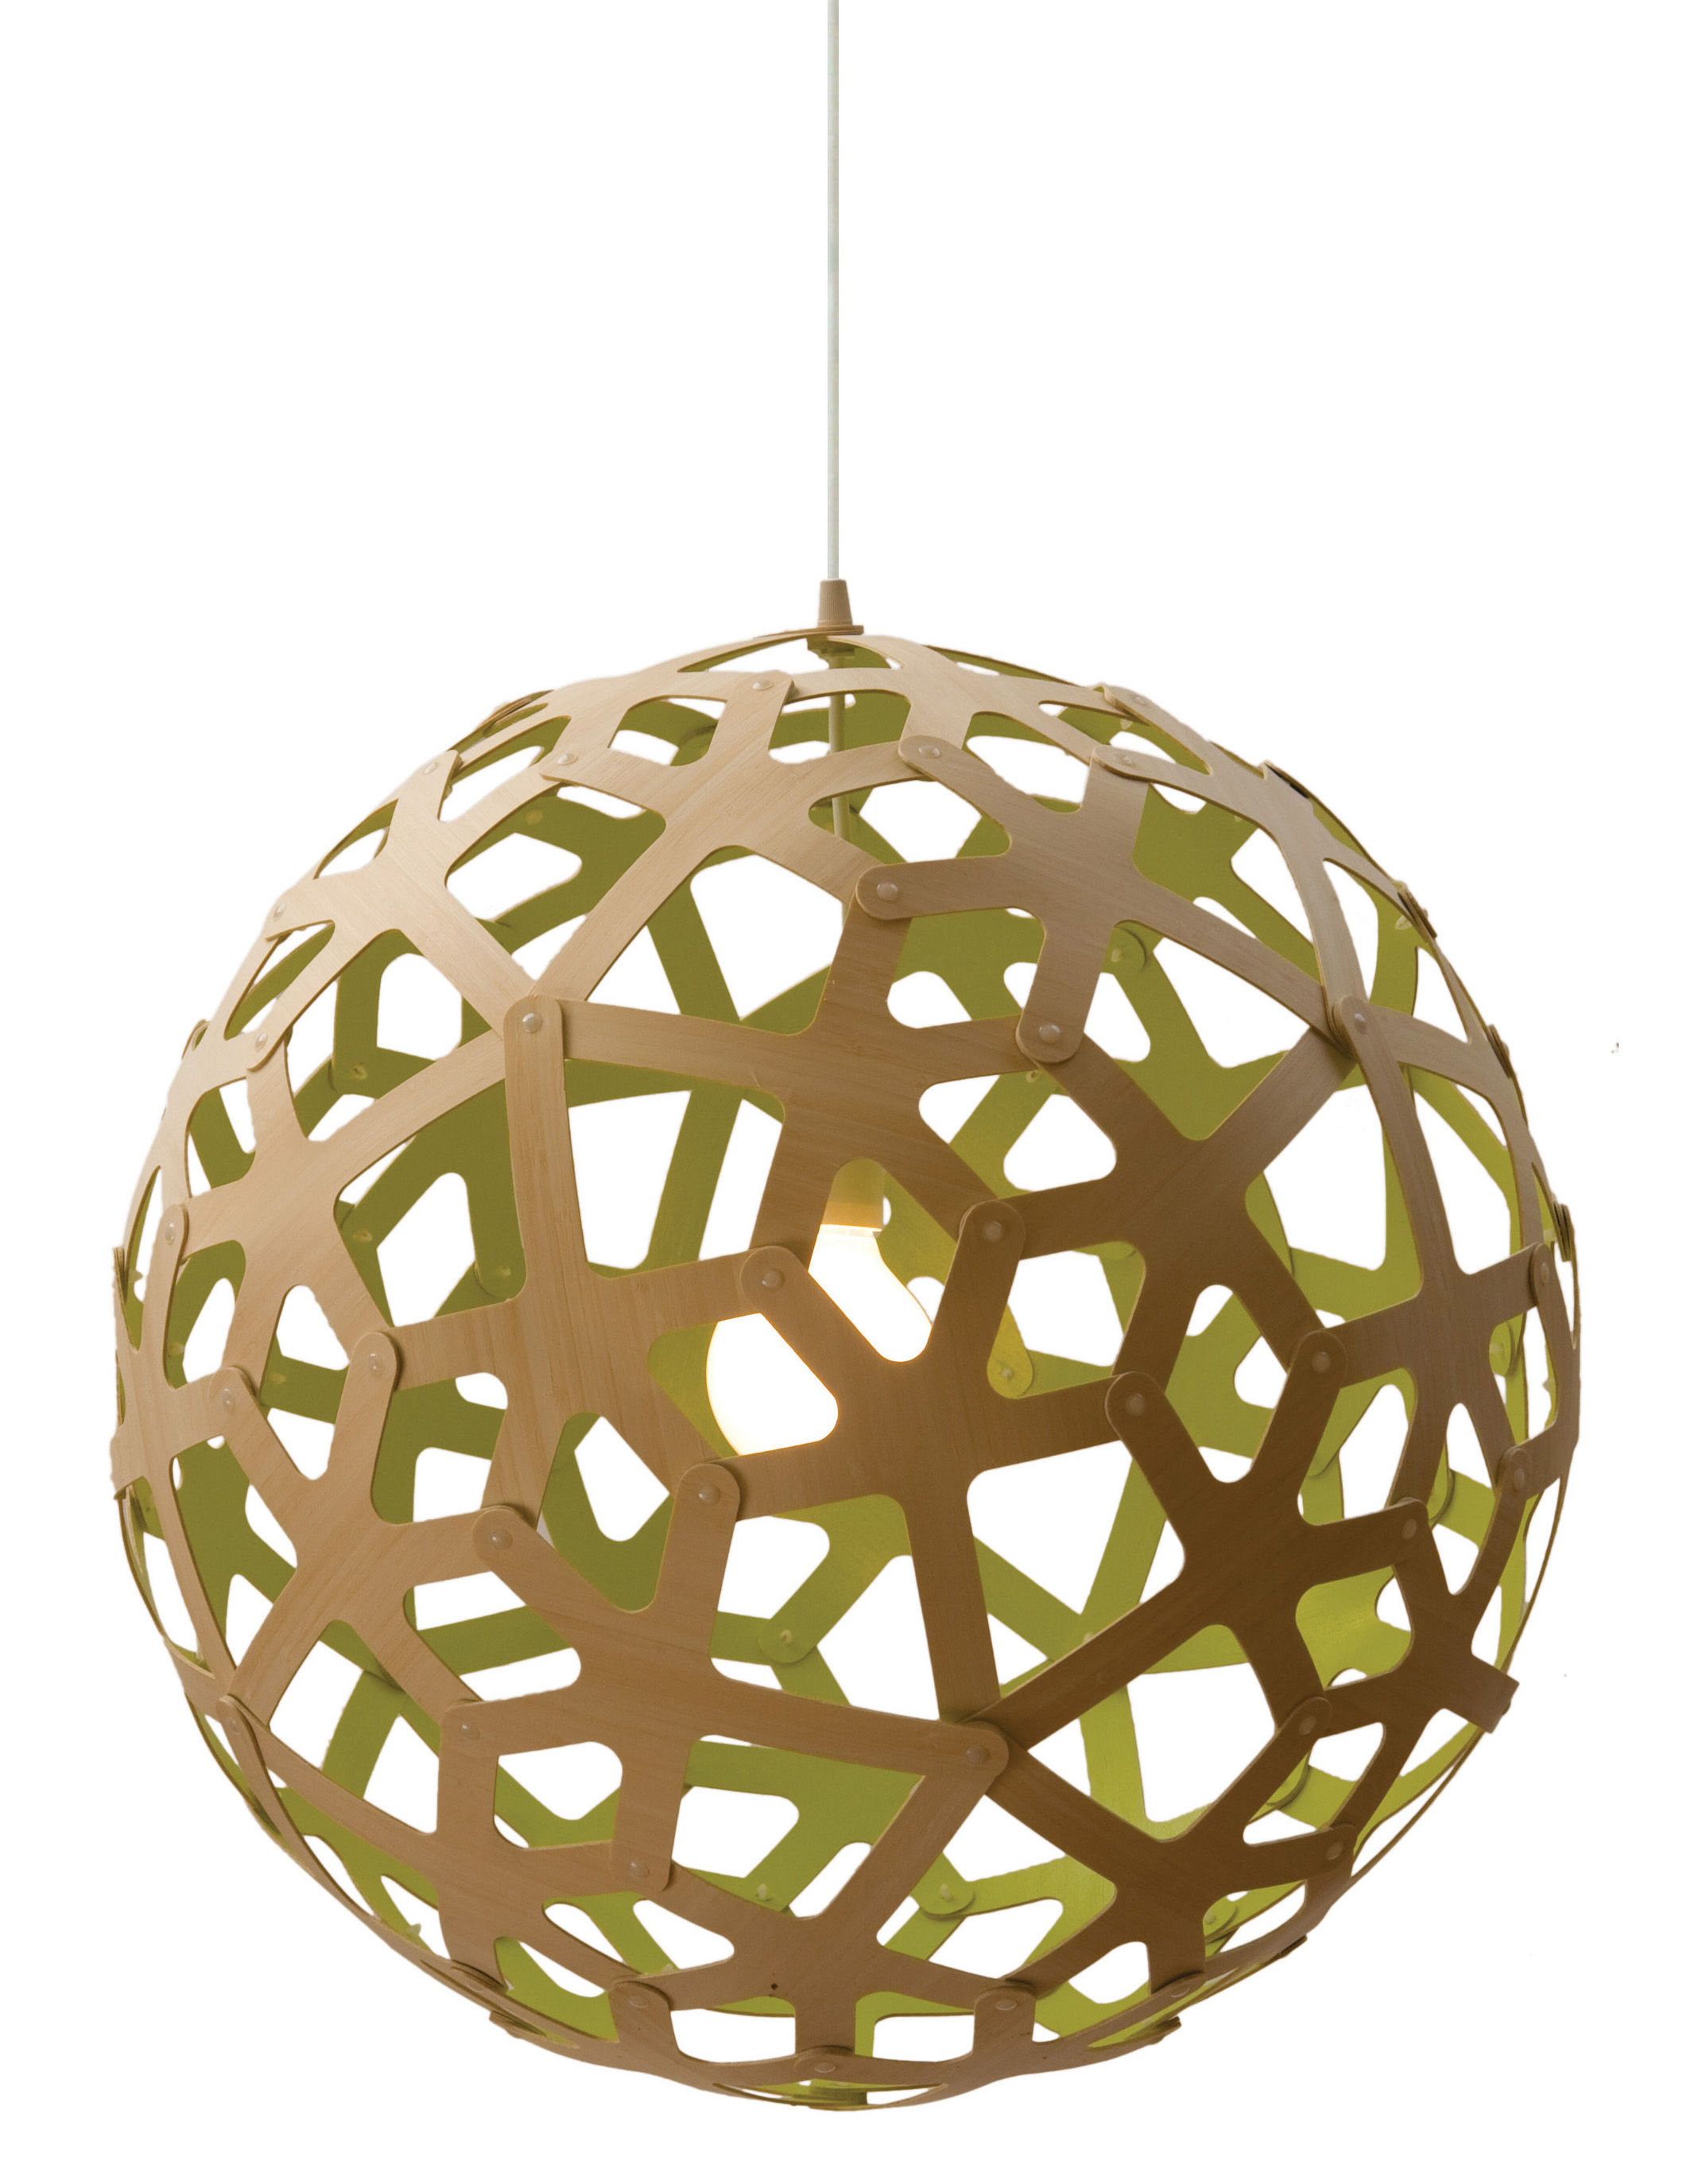 Lighting - Pendant Lighting - Coral Pendant - / Ø 60 cm - Bicoloured by David Trubridge - Lime green / Natural wood - Pine